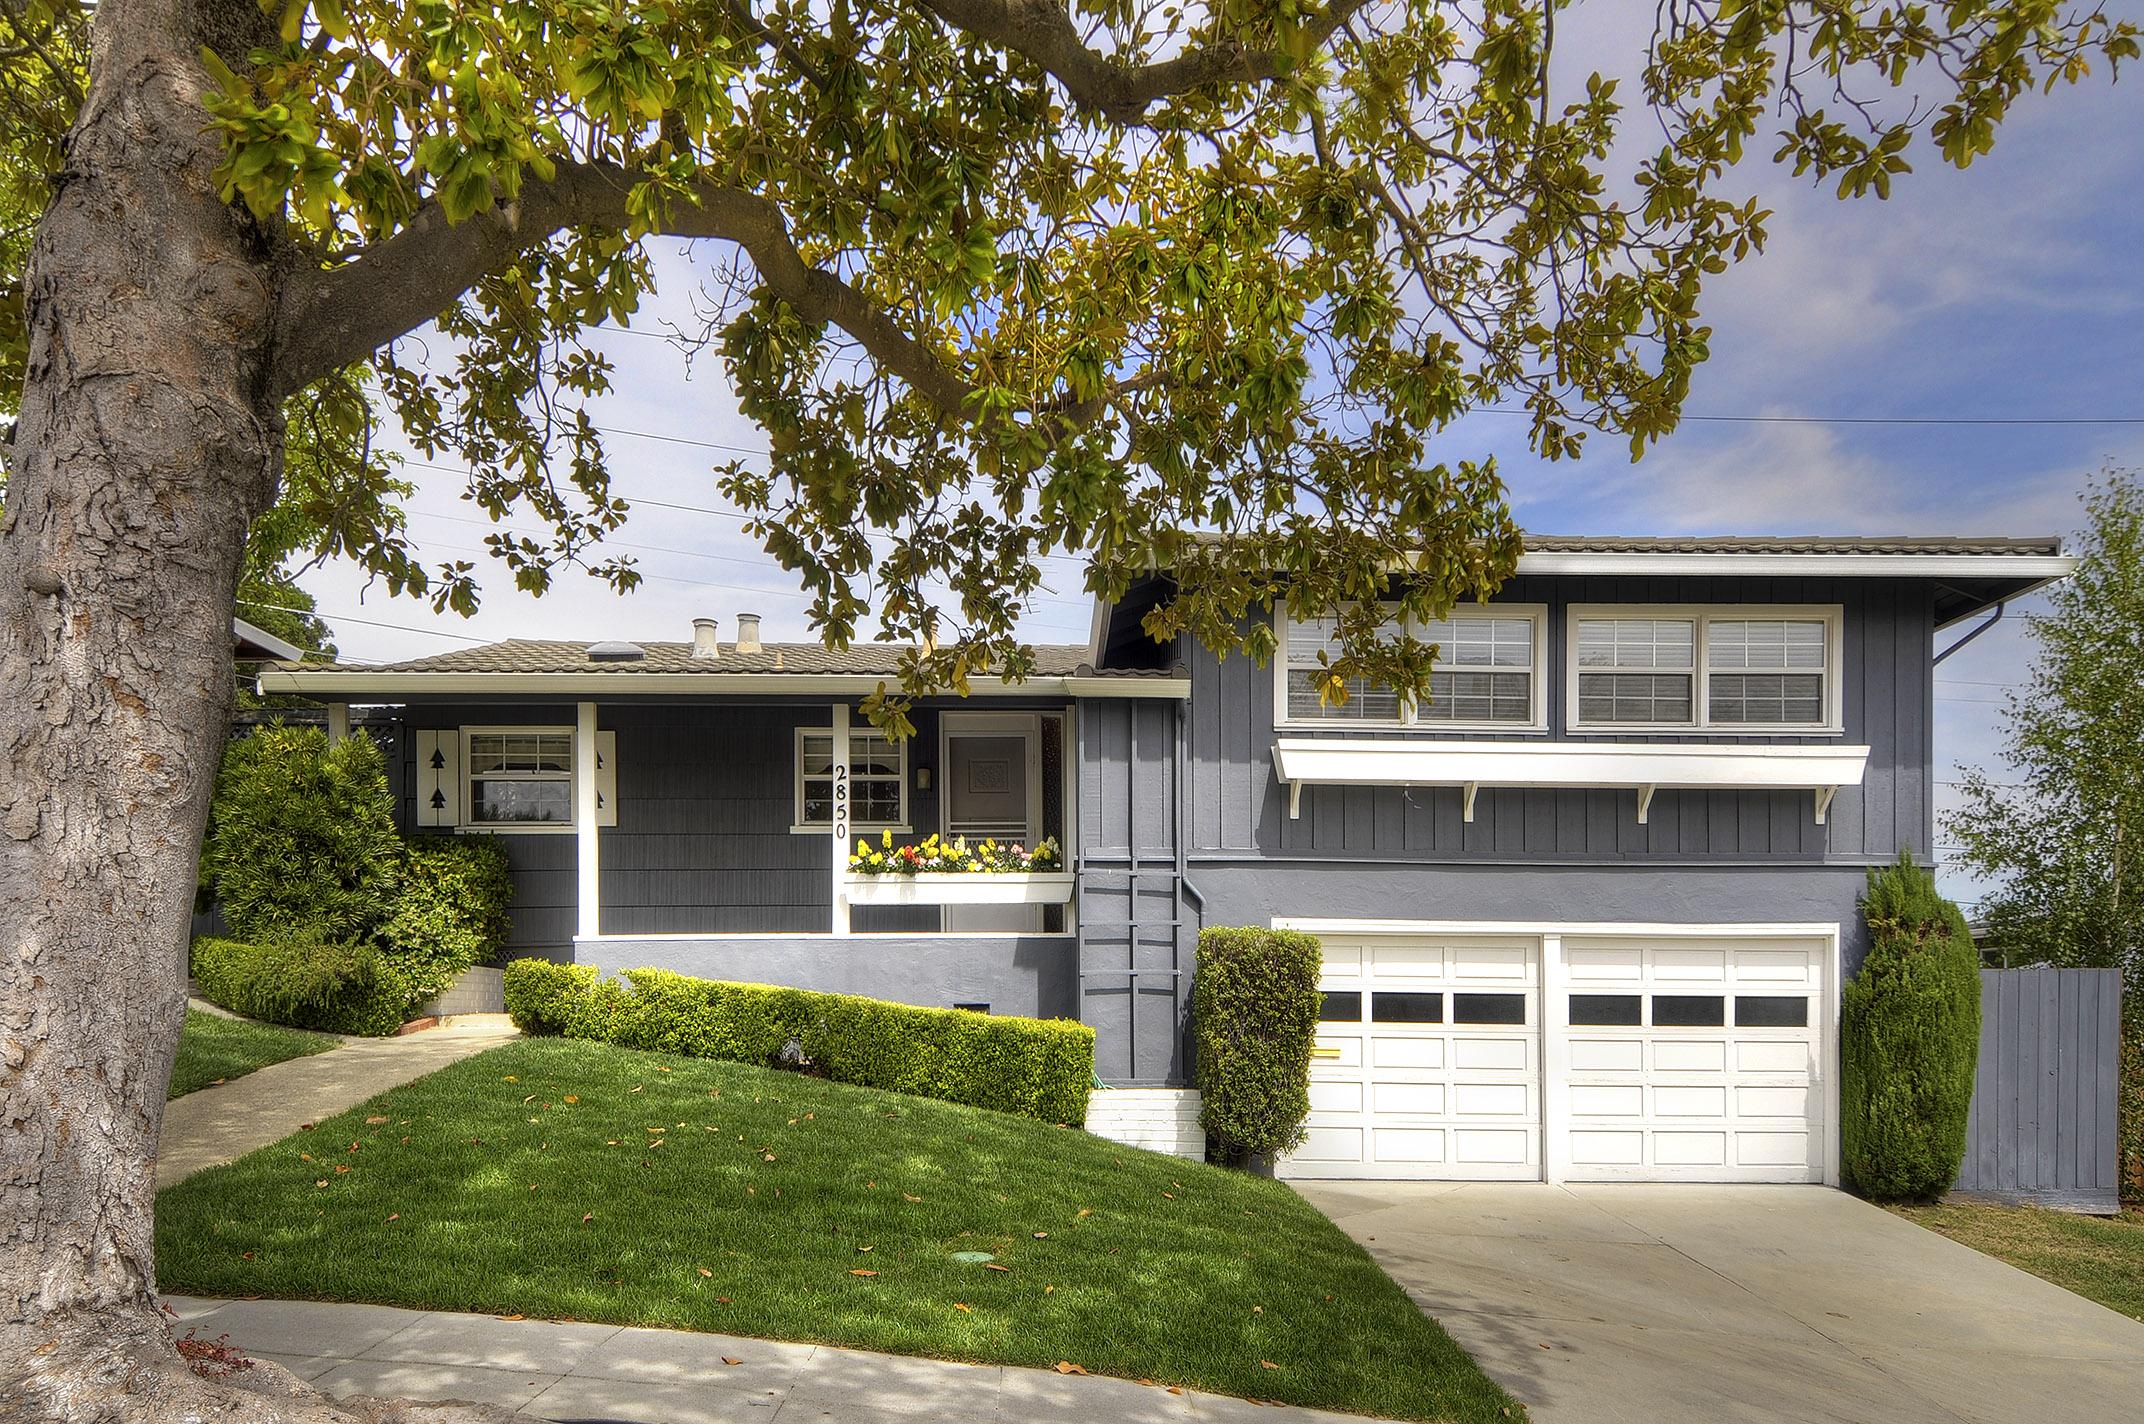 2850 Medford Ave, Redwood City, CA 94061